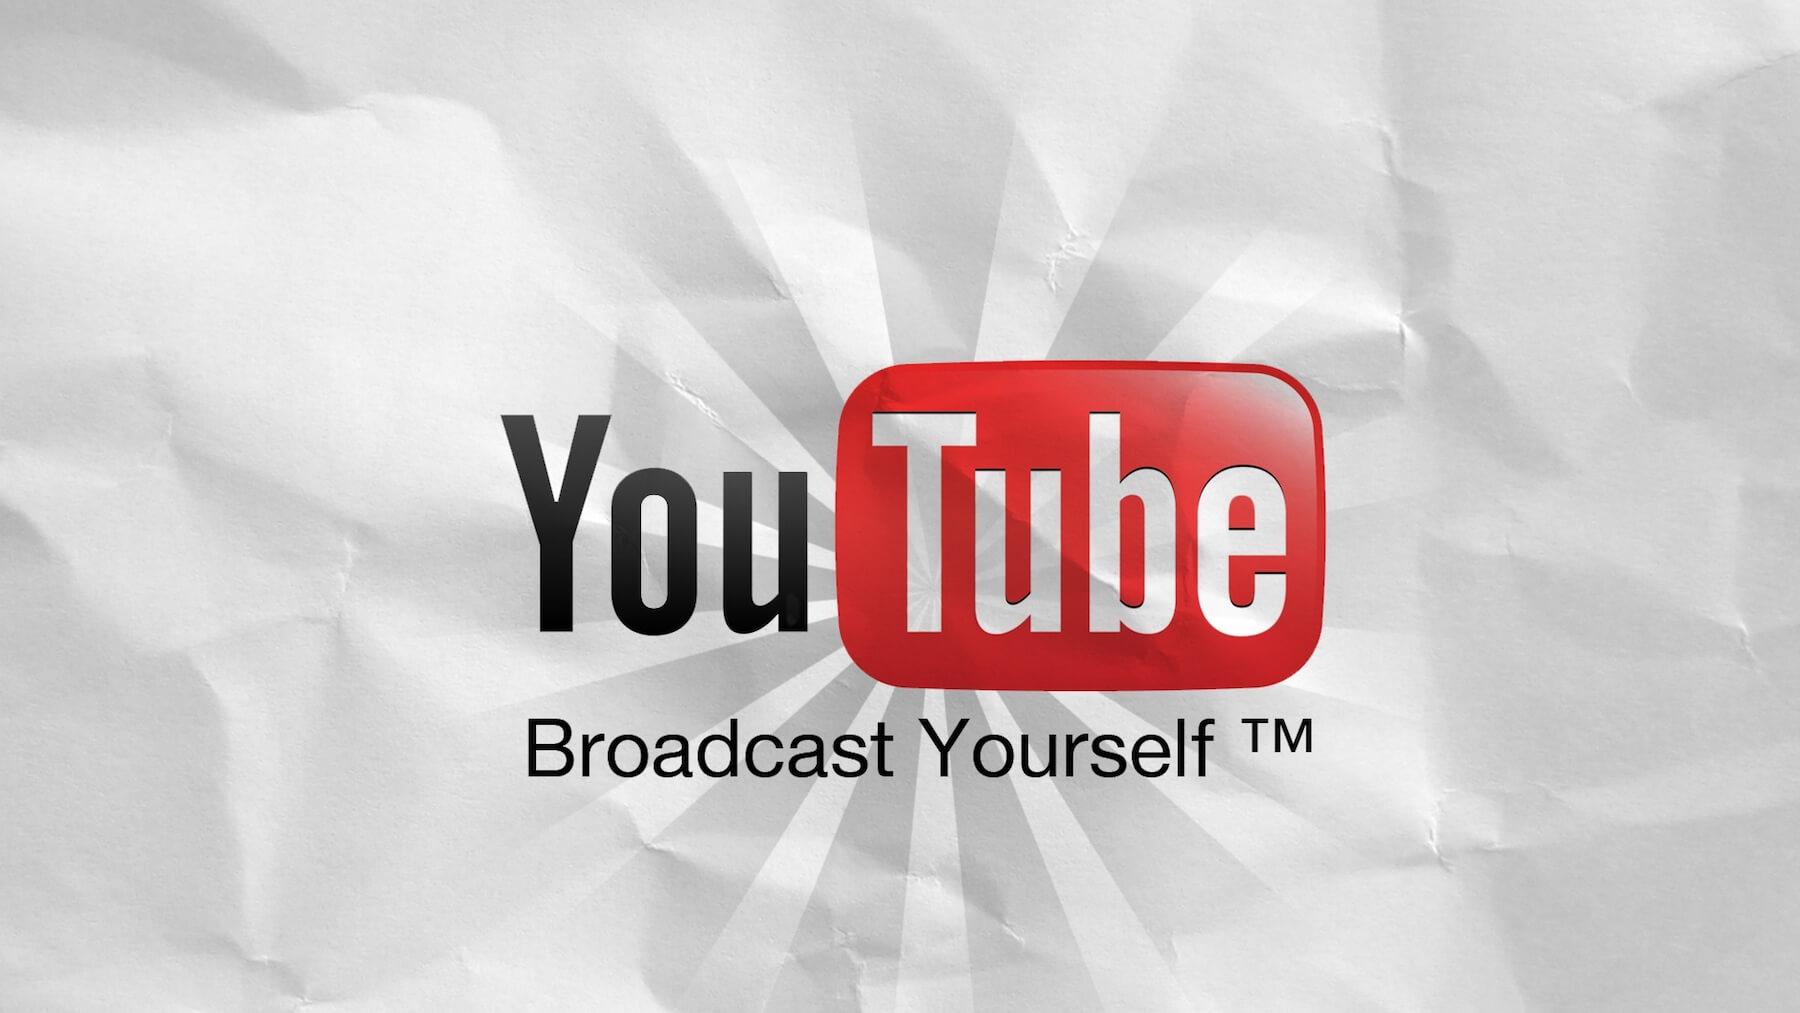 Youtube-TM Federal Lawsuit Filed Against Google & Youtube - Claim Alleges Pelosi & Schiff Coerced Youtube